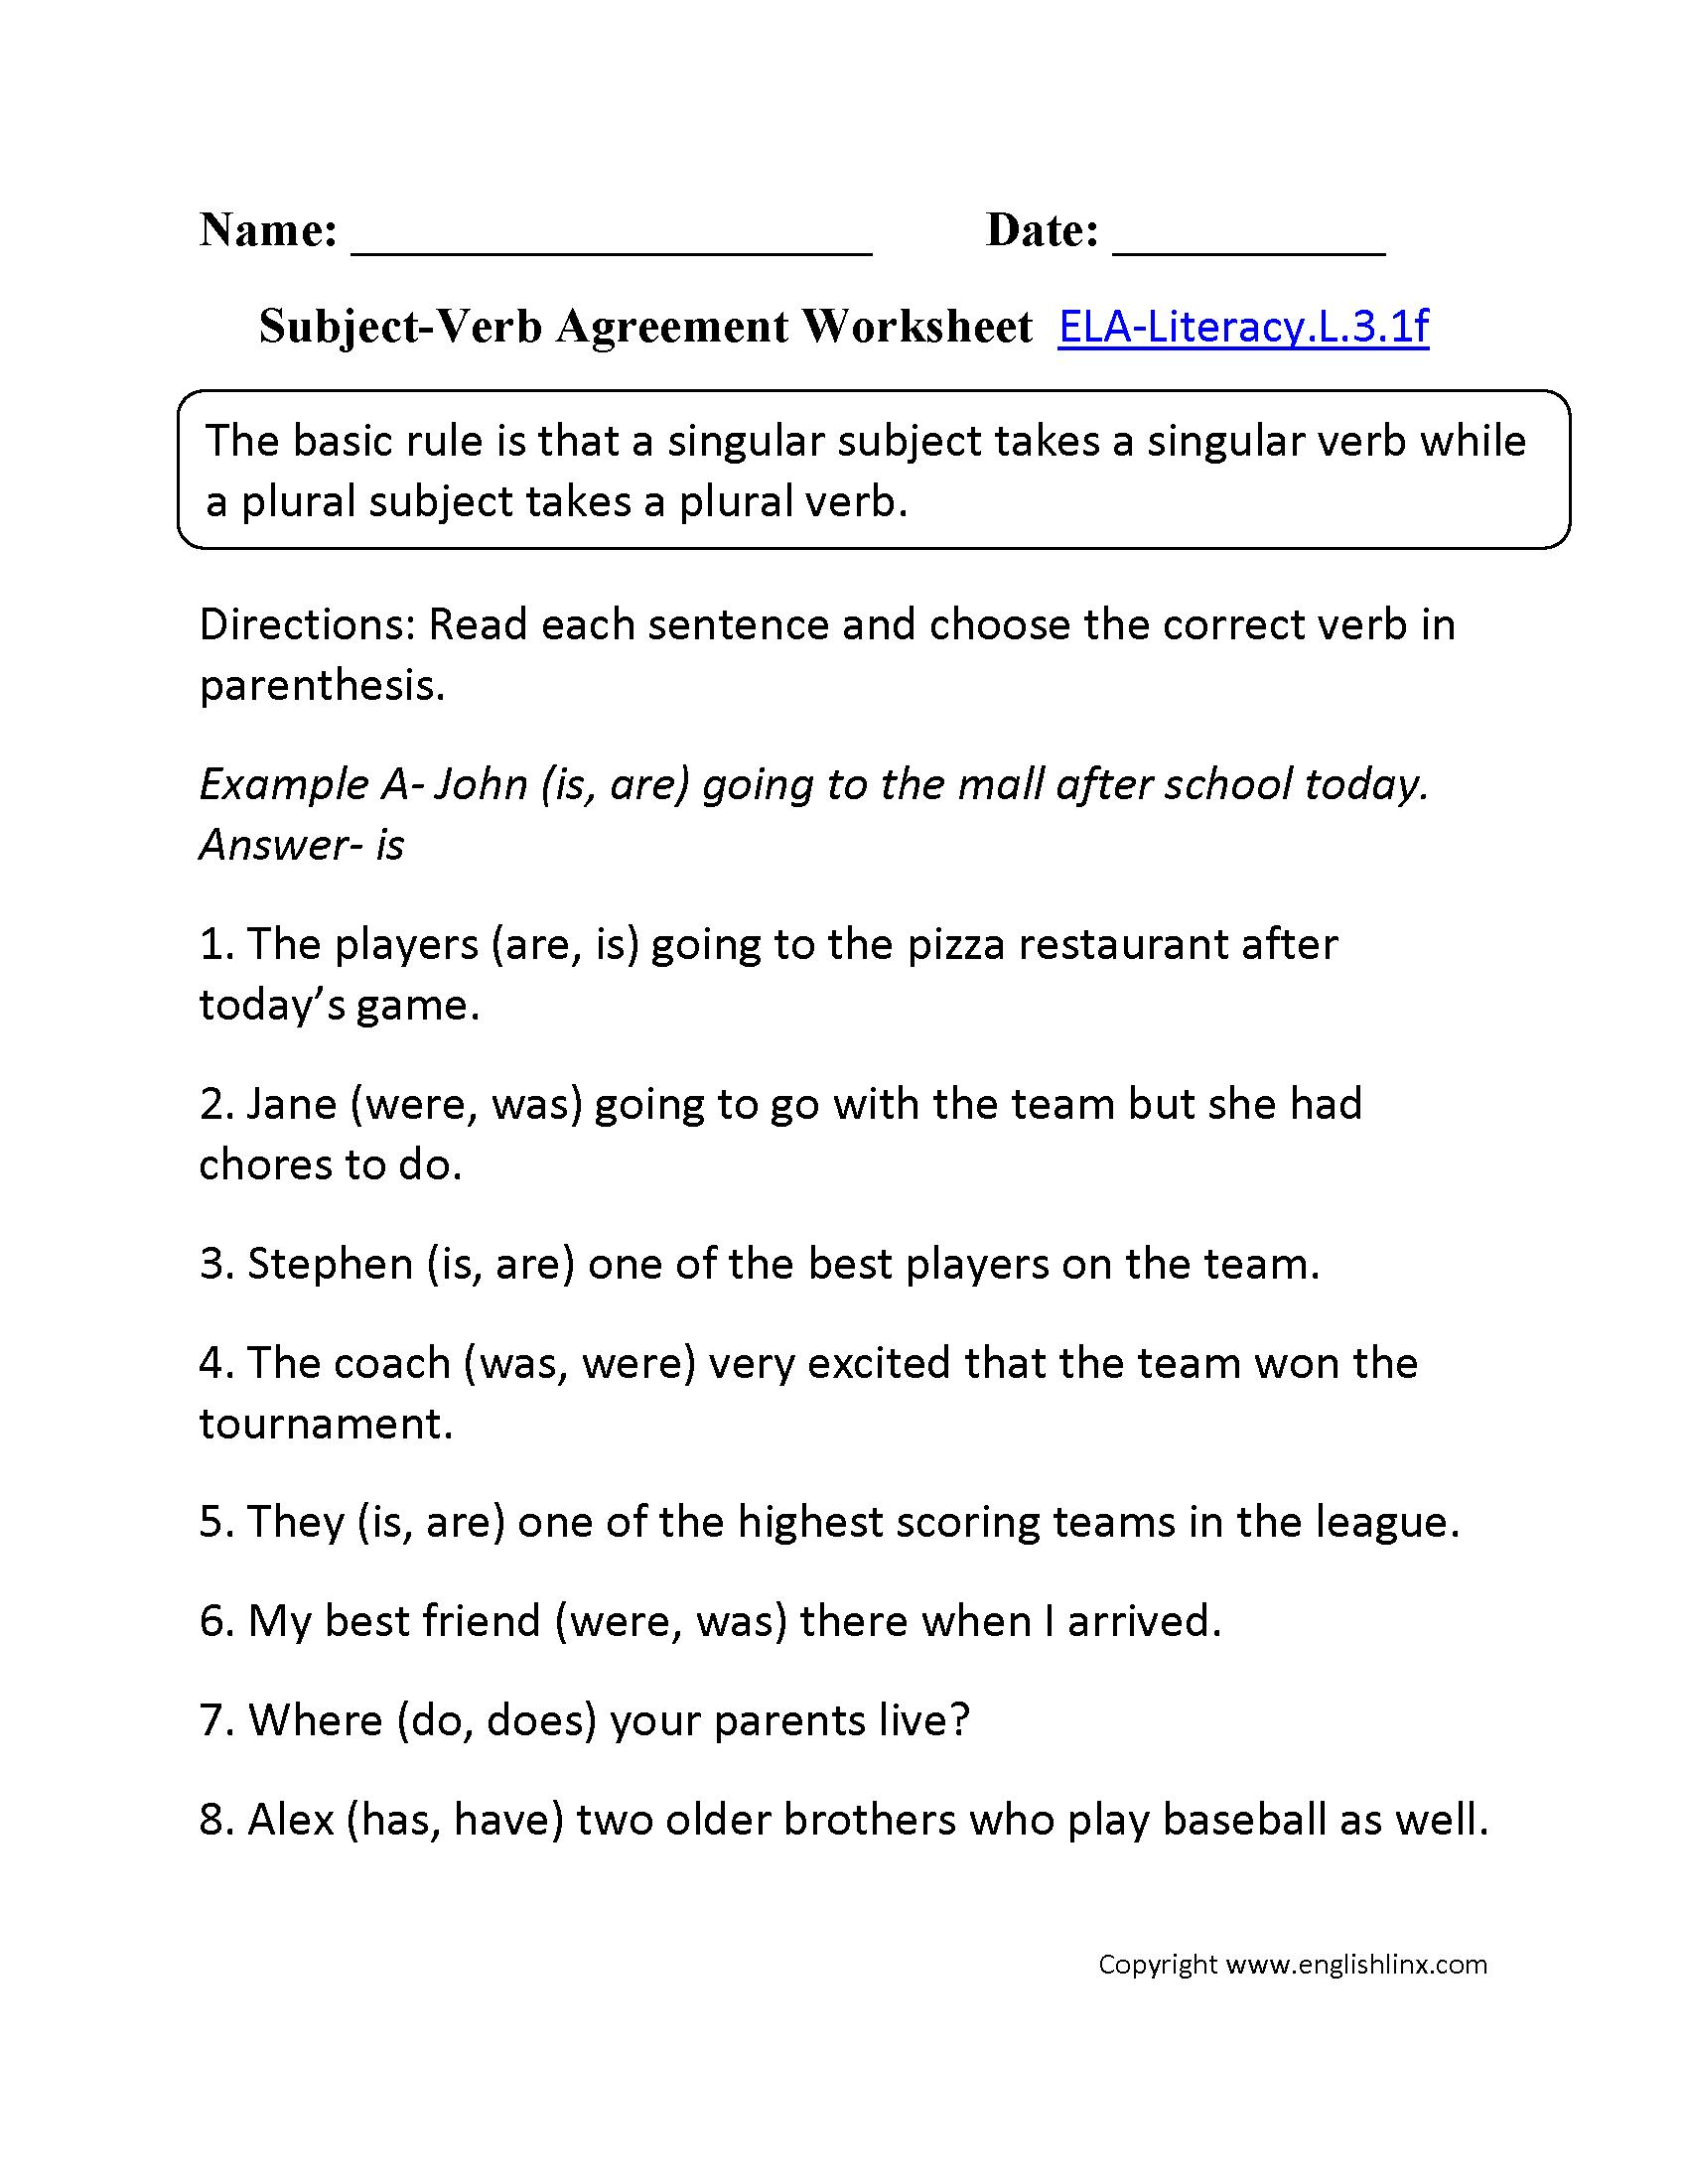 worksheet Subject And Verb Worksheets subject verb agreement worksheet 2 l 3 1 pinterest 1